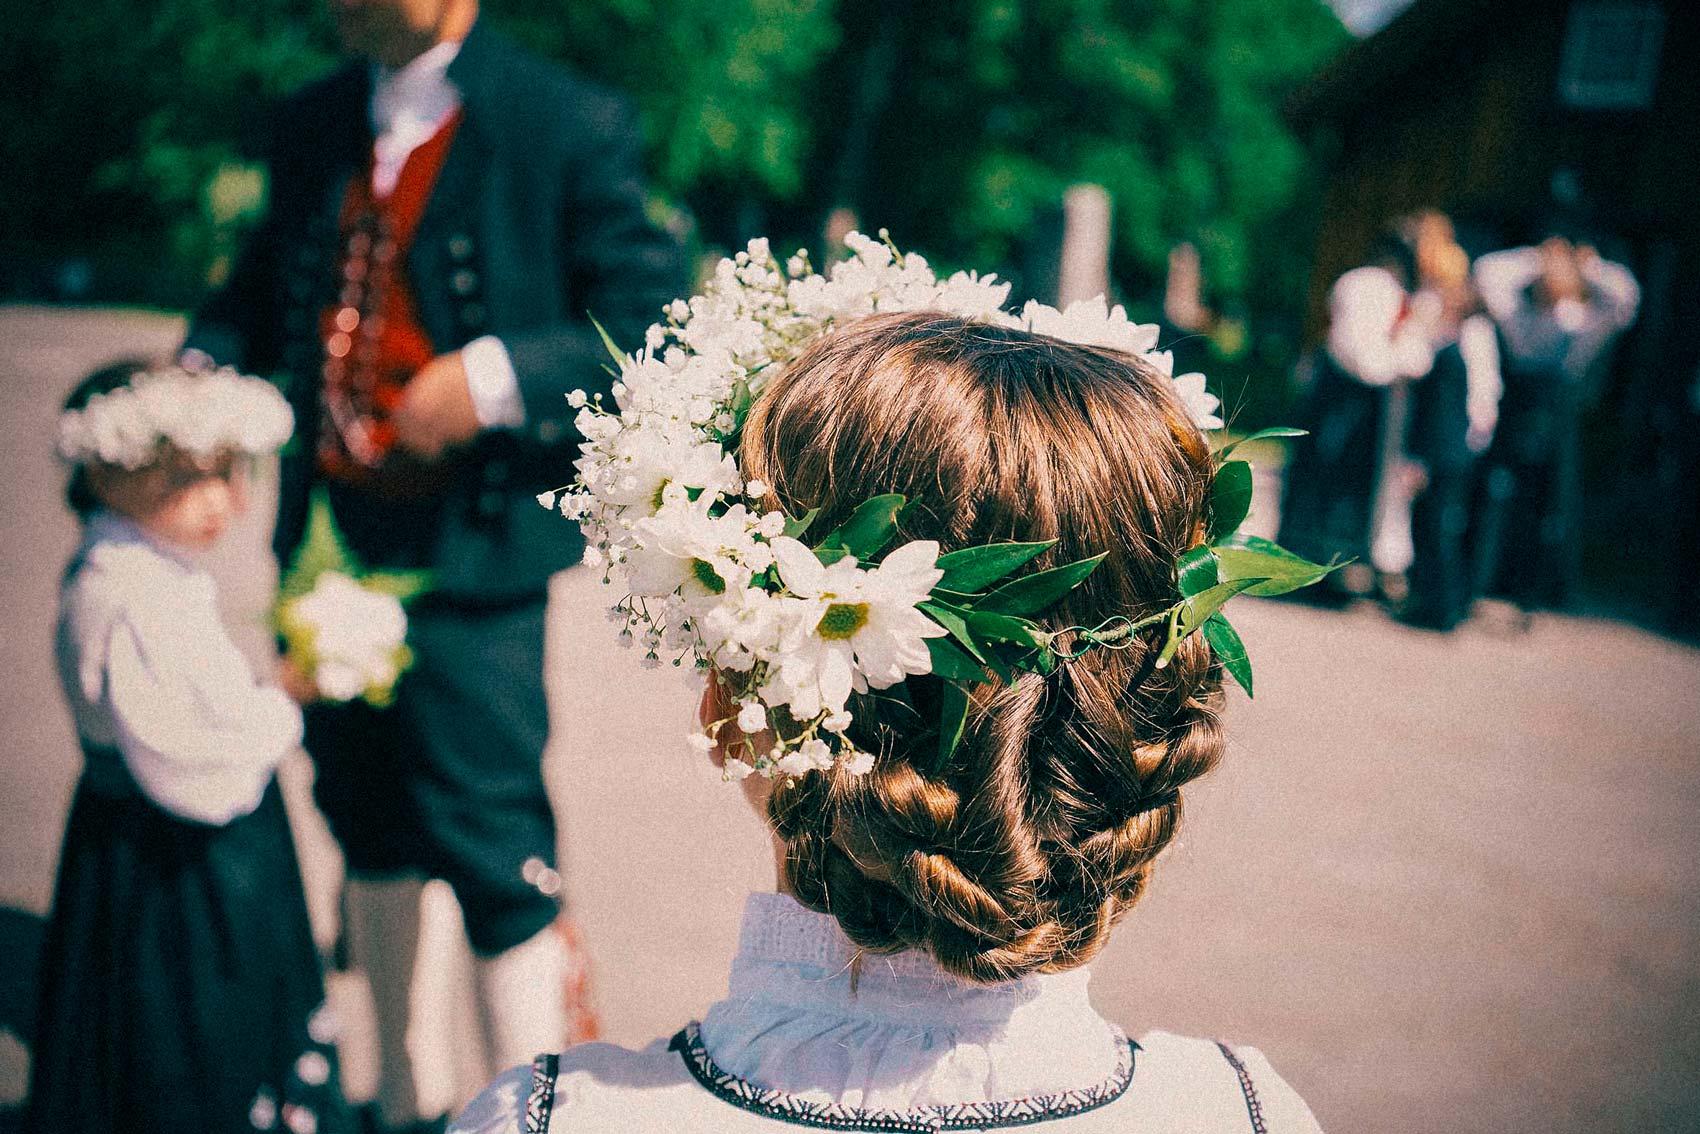 pike med bunad er gjest i bryllup, hun har blomster i håret